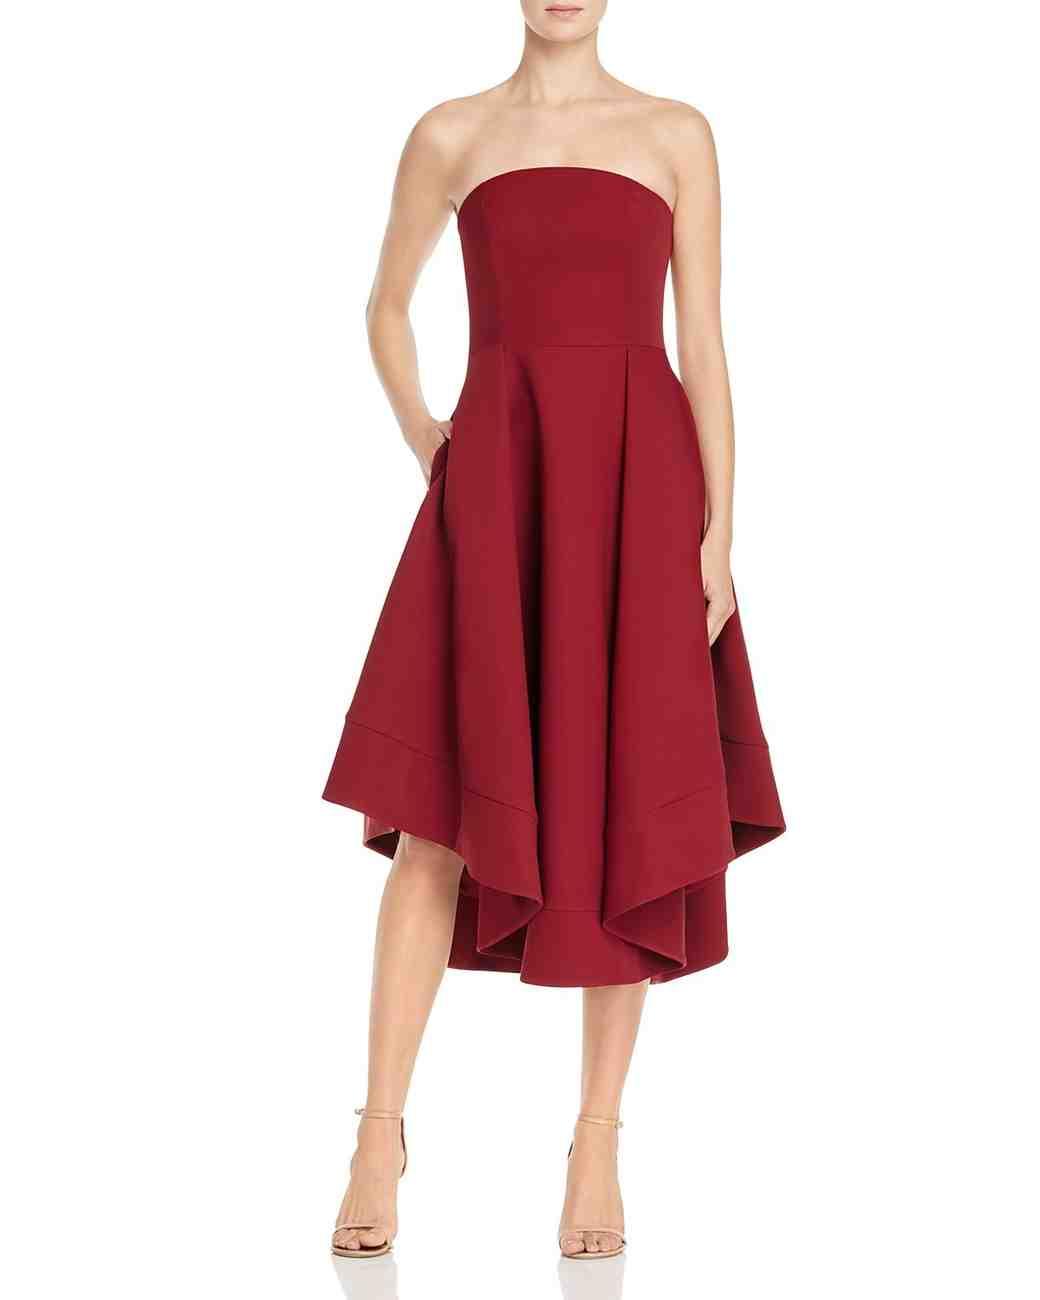 burgundy bridesmaid dress – c/meo making waves